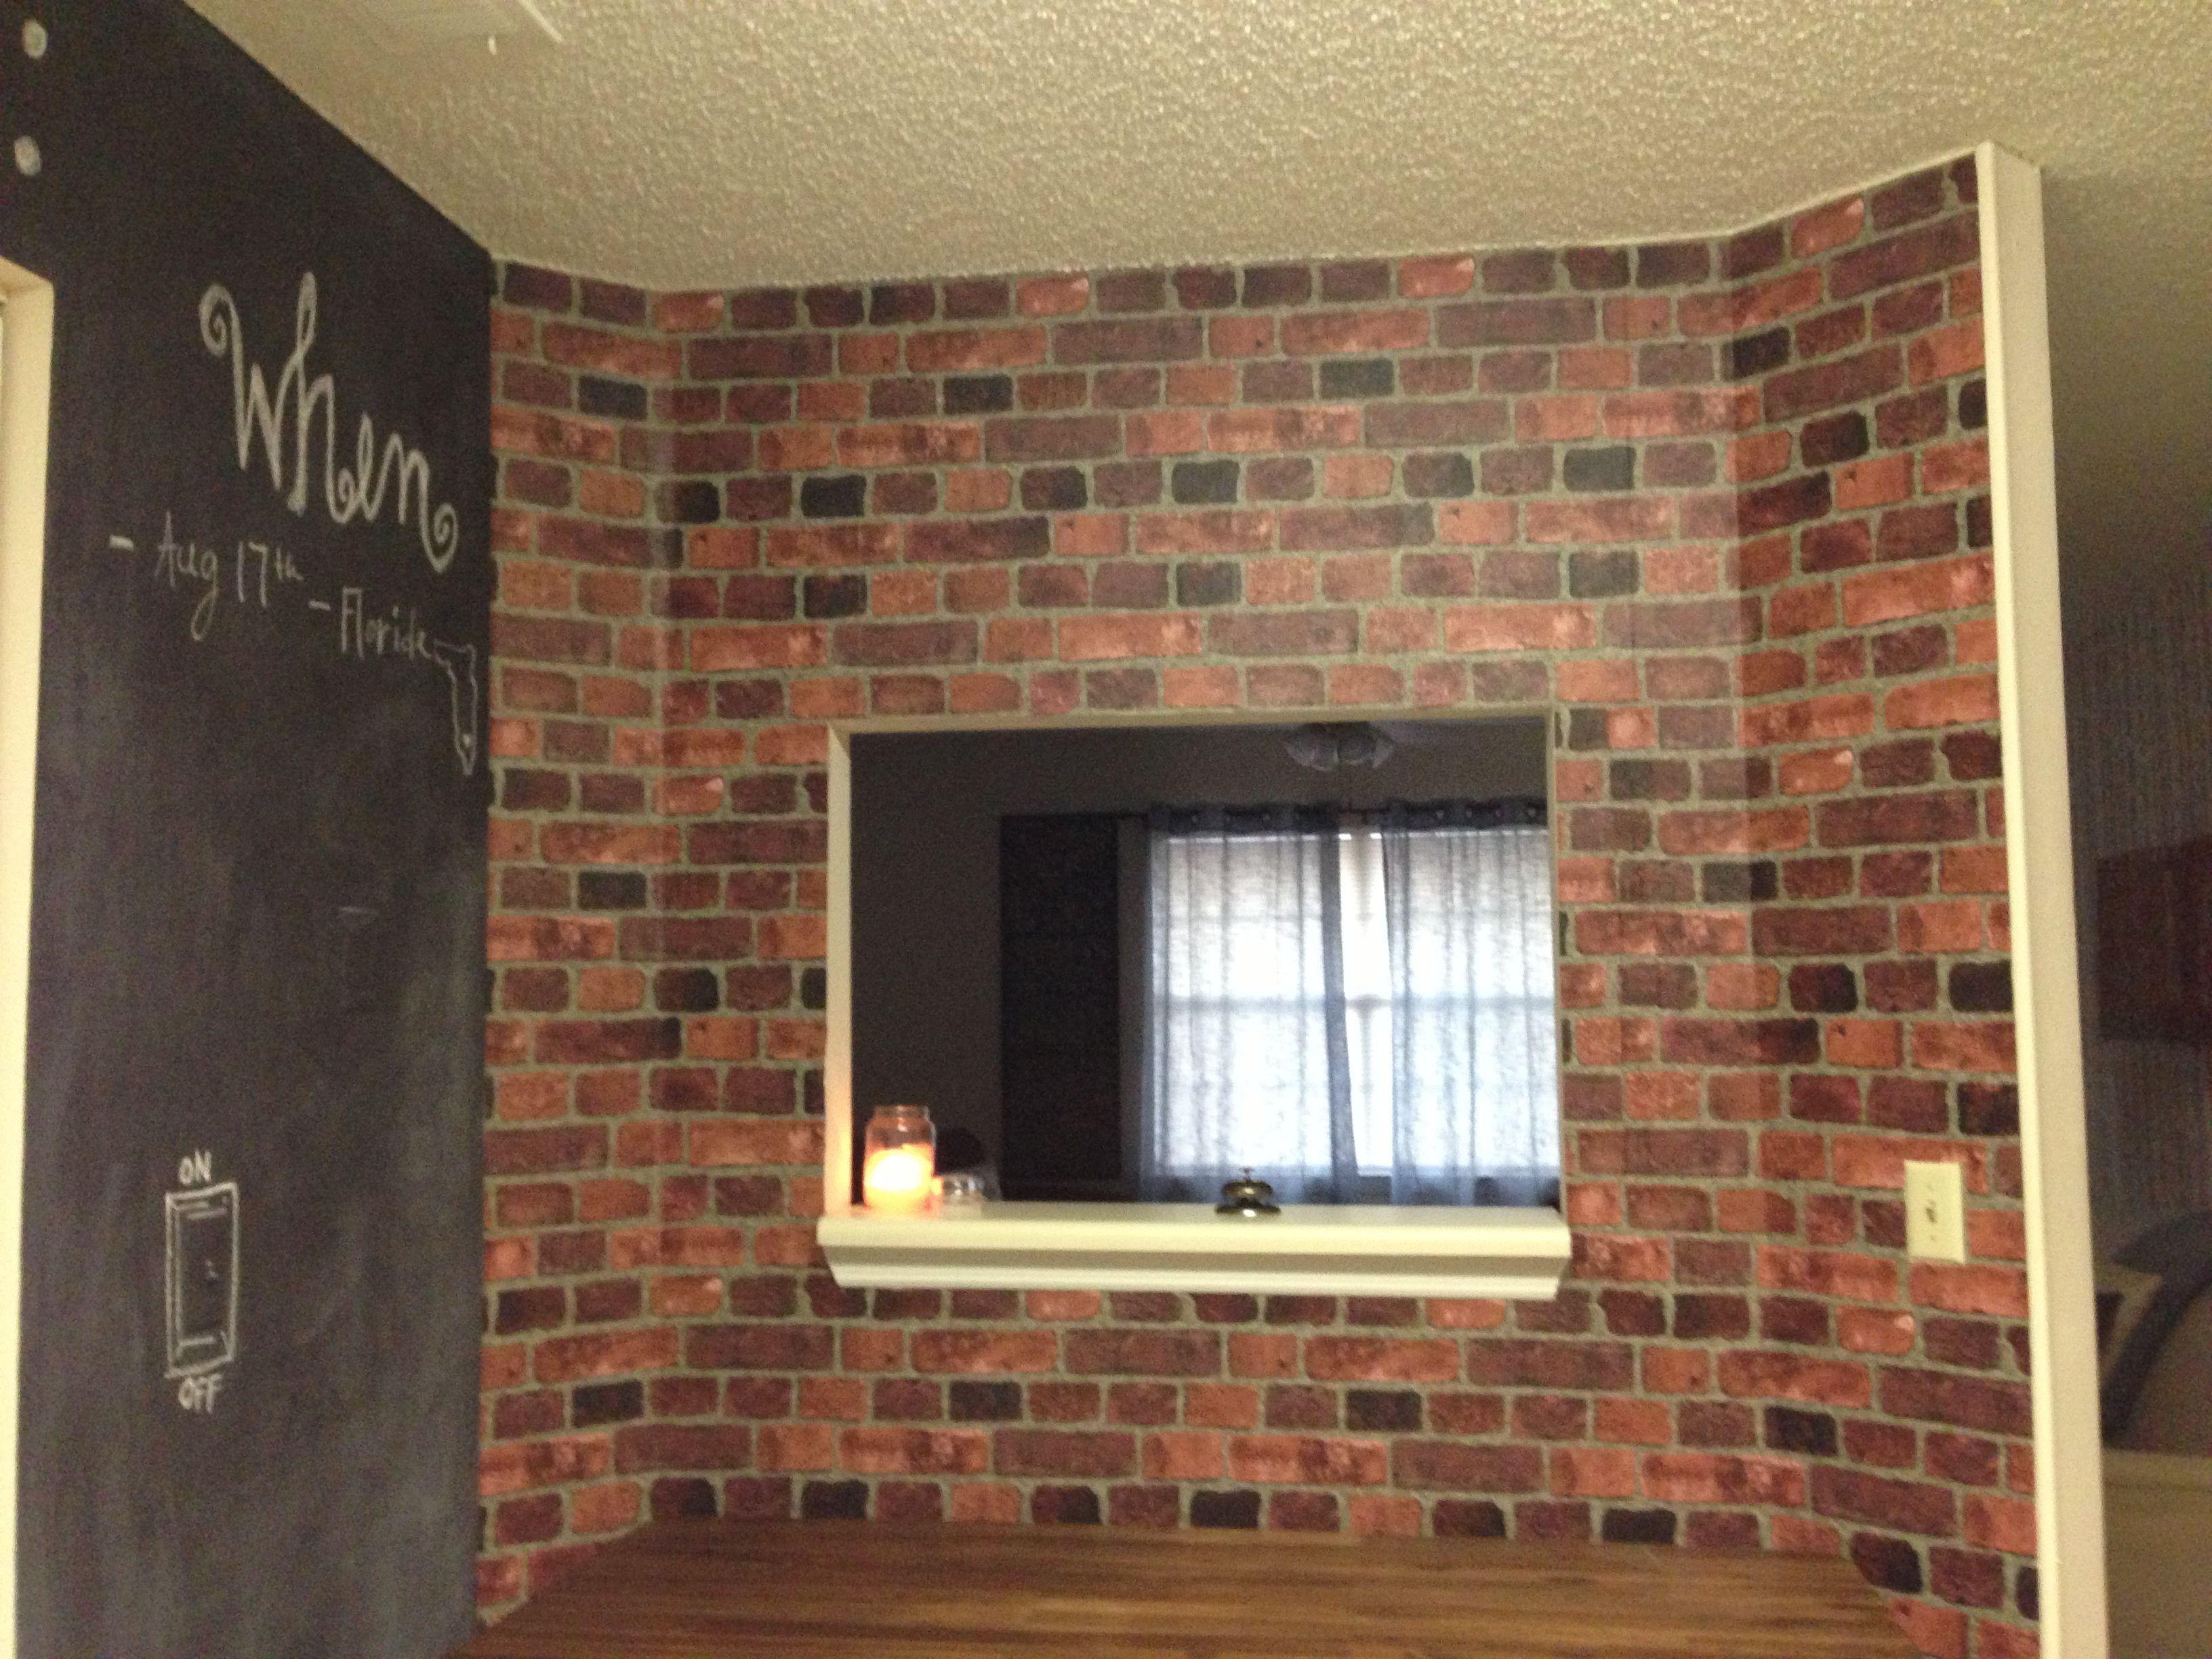 amusing industrial kitchen brick wall   Faux Brick wall   Industrial loft Kitchen Makeover Edition ...